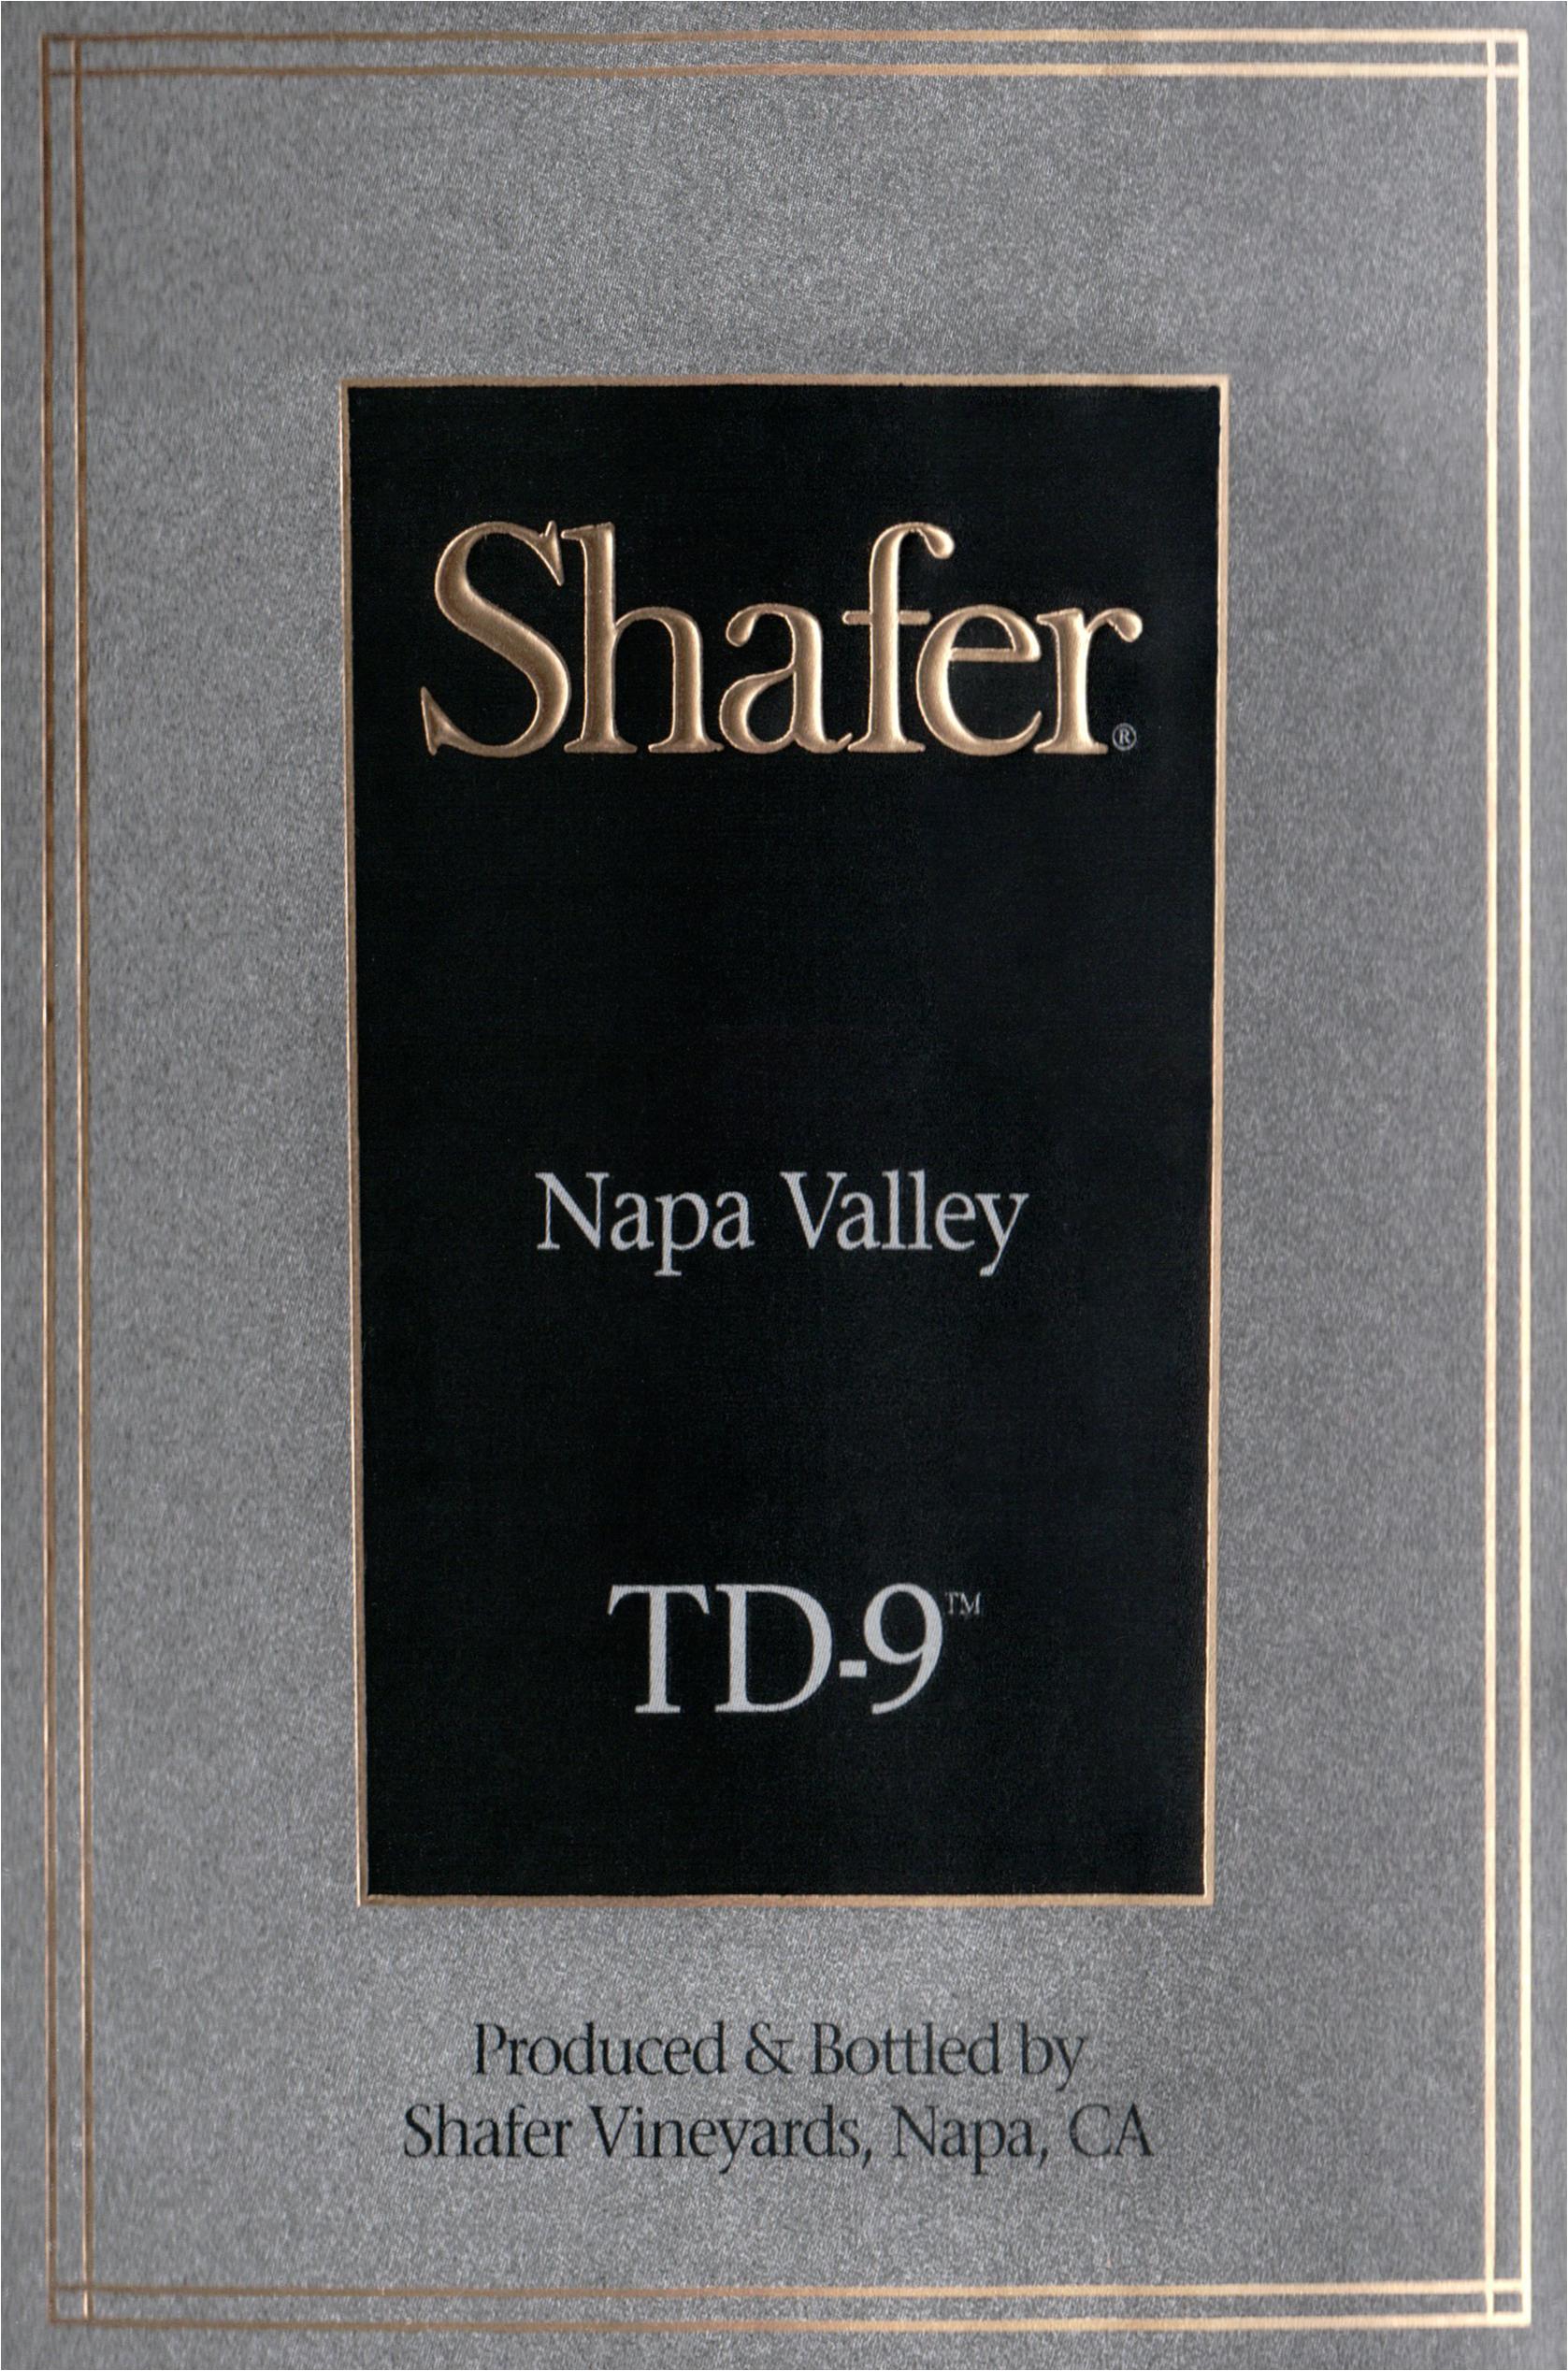 Shafer Td 9 Red 2017